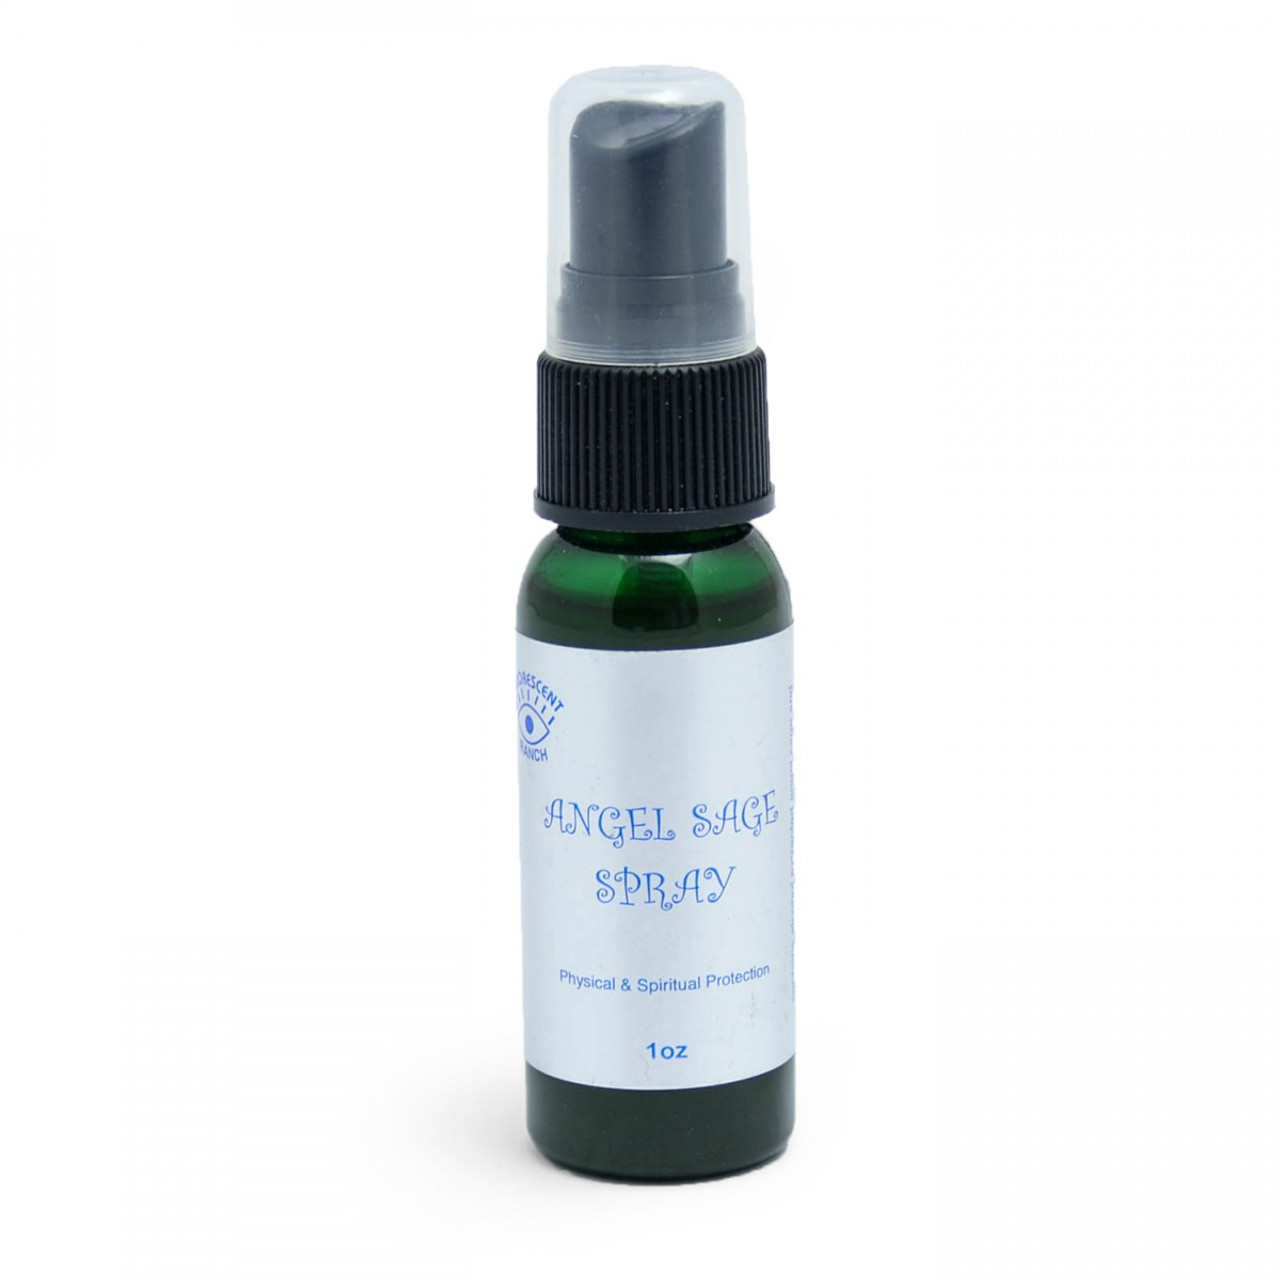 Angel Sage Natural Room Spray (1oz)